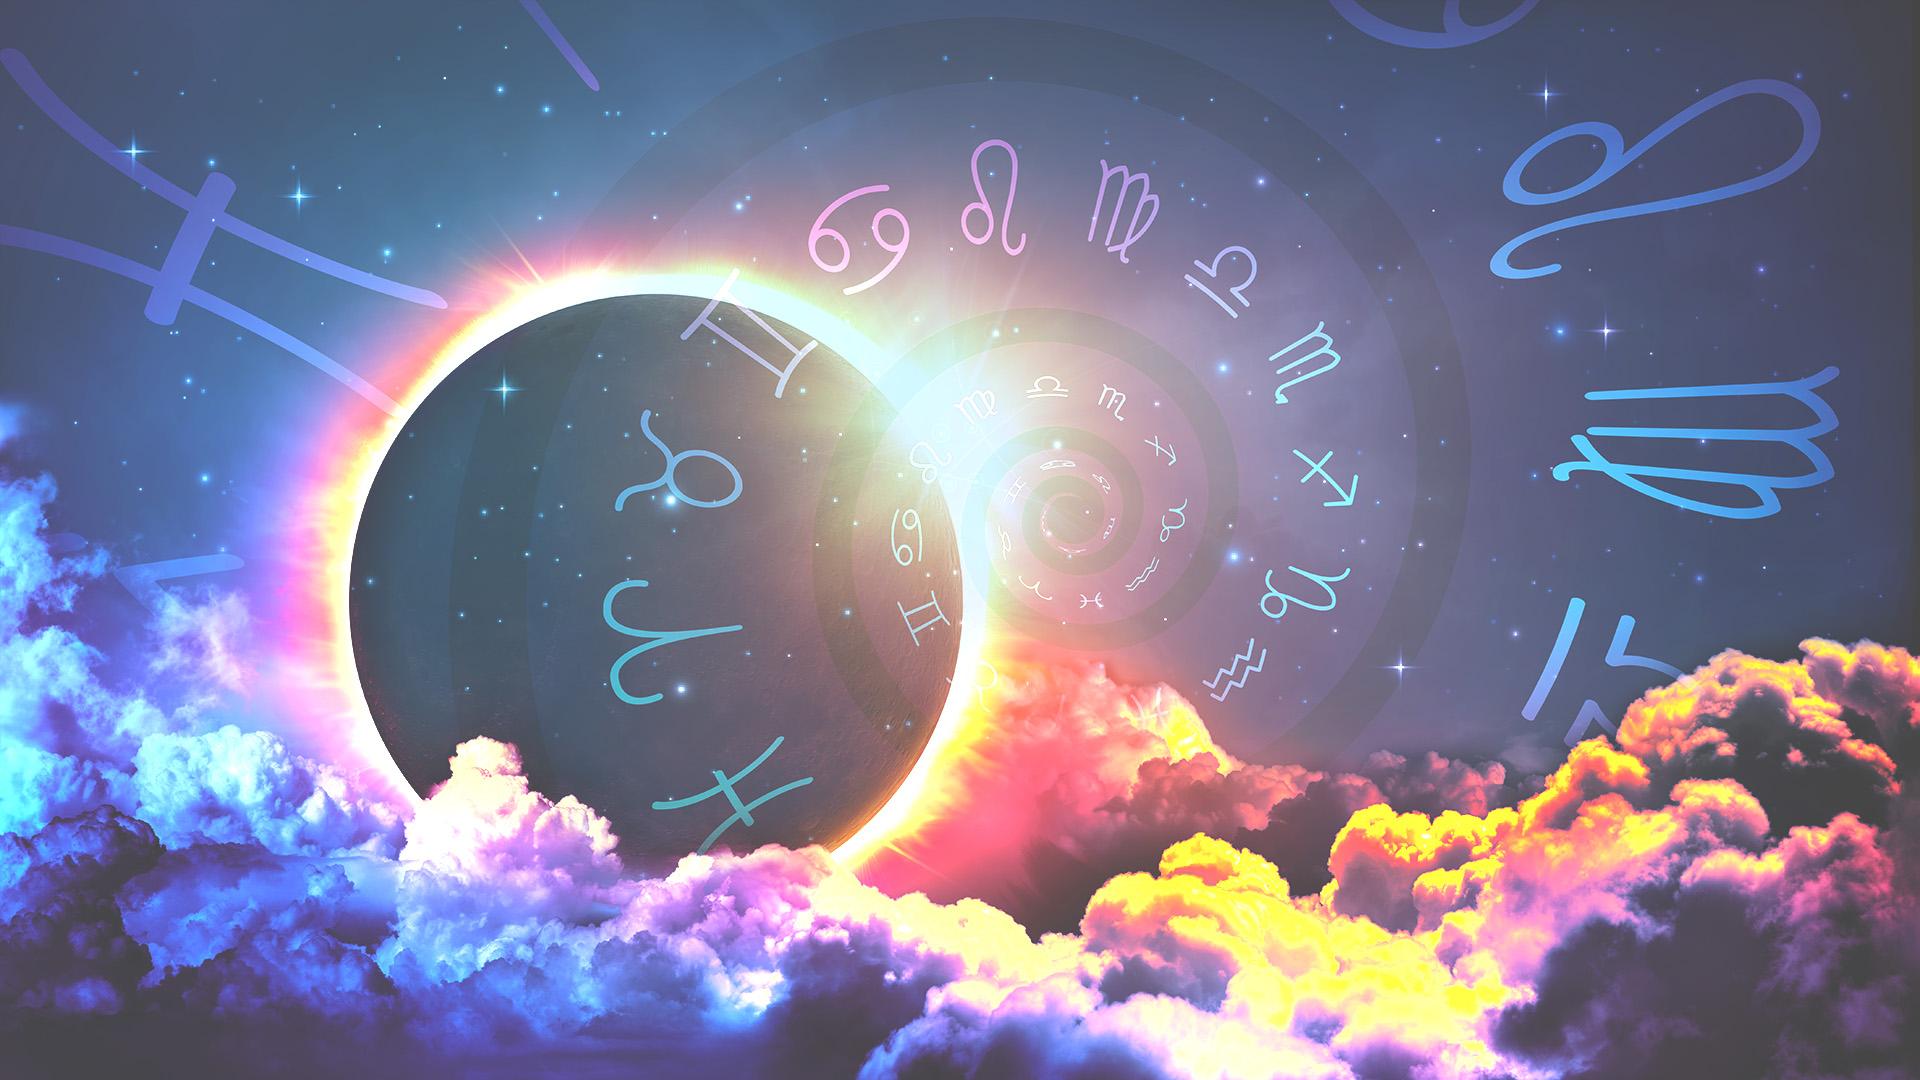 march 2 solar eclipse horoscope